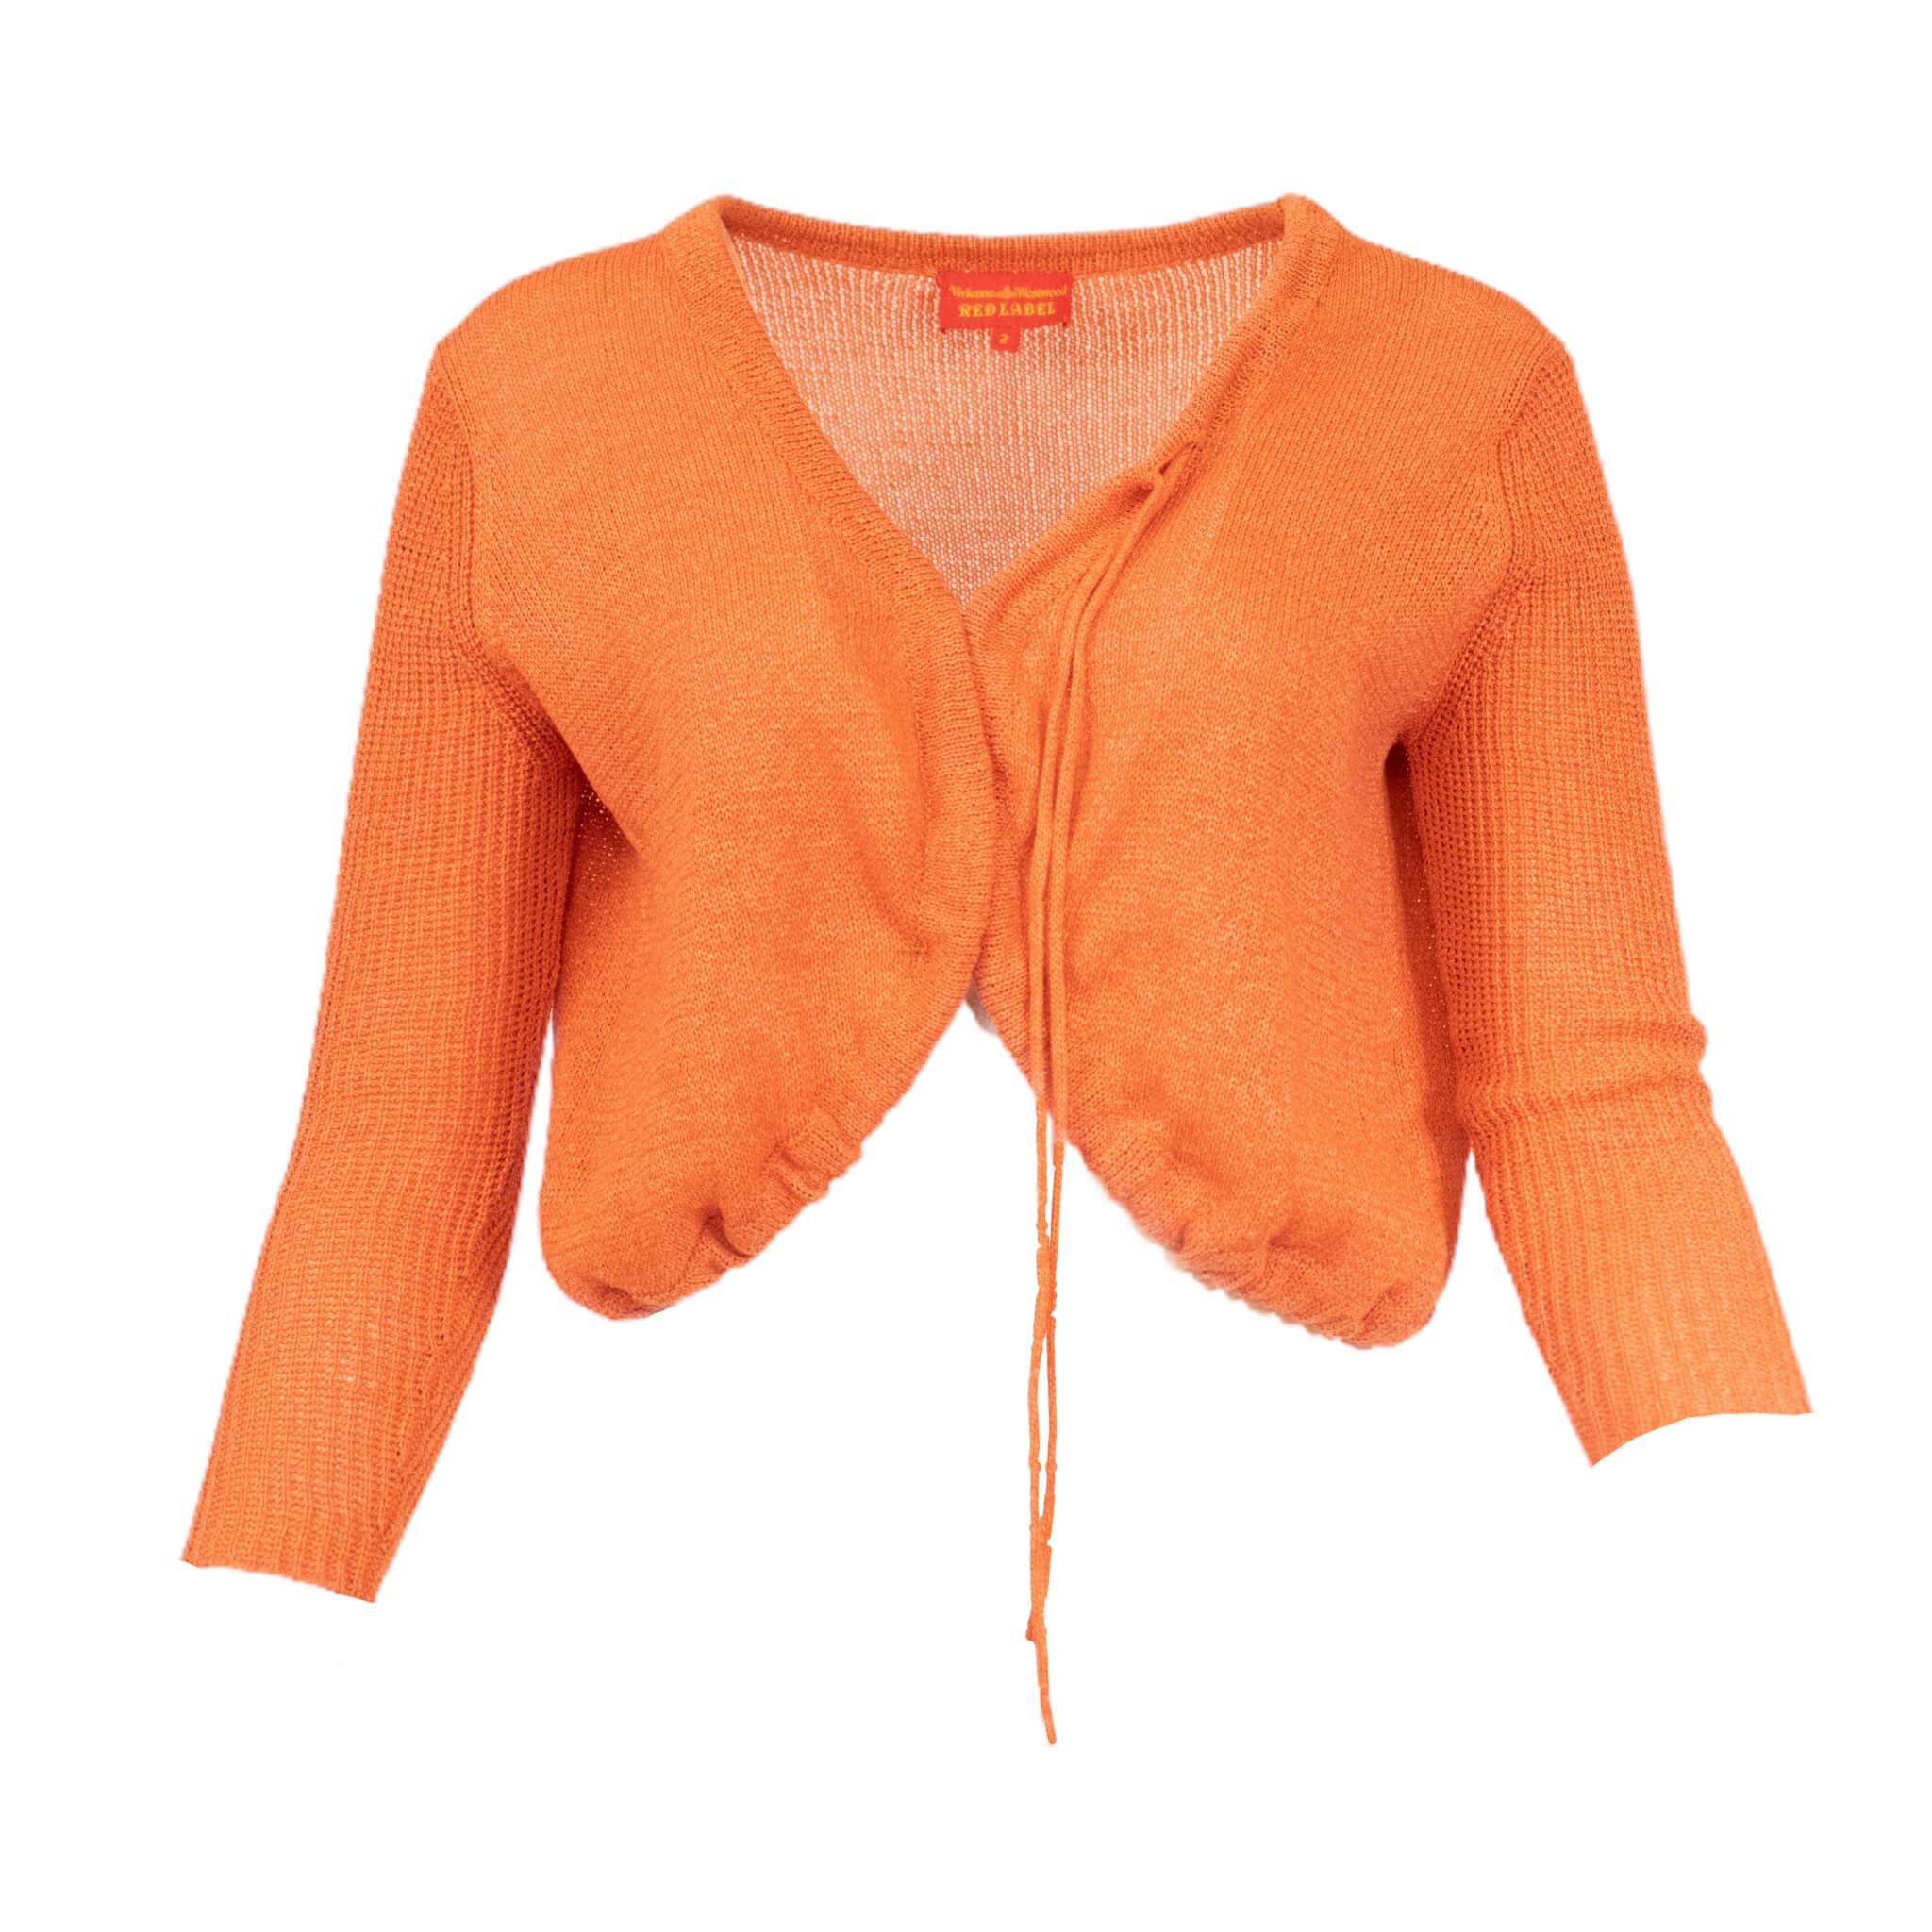 Vivienne Westwood Orange Dream Cardigan